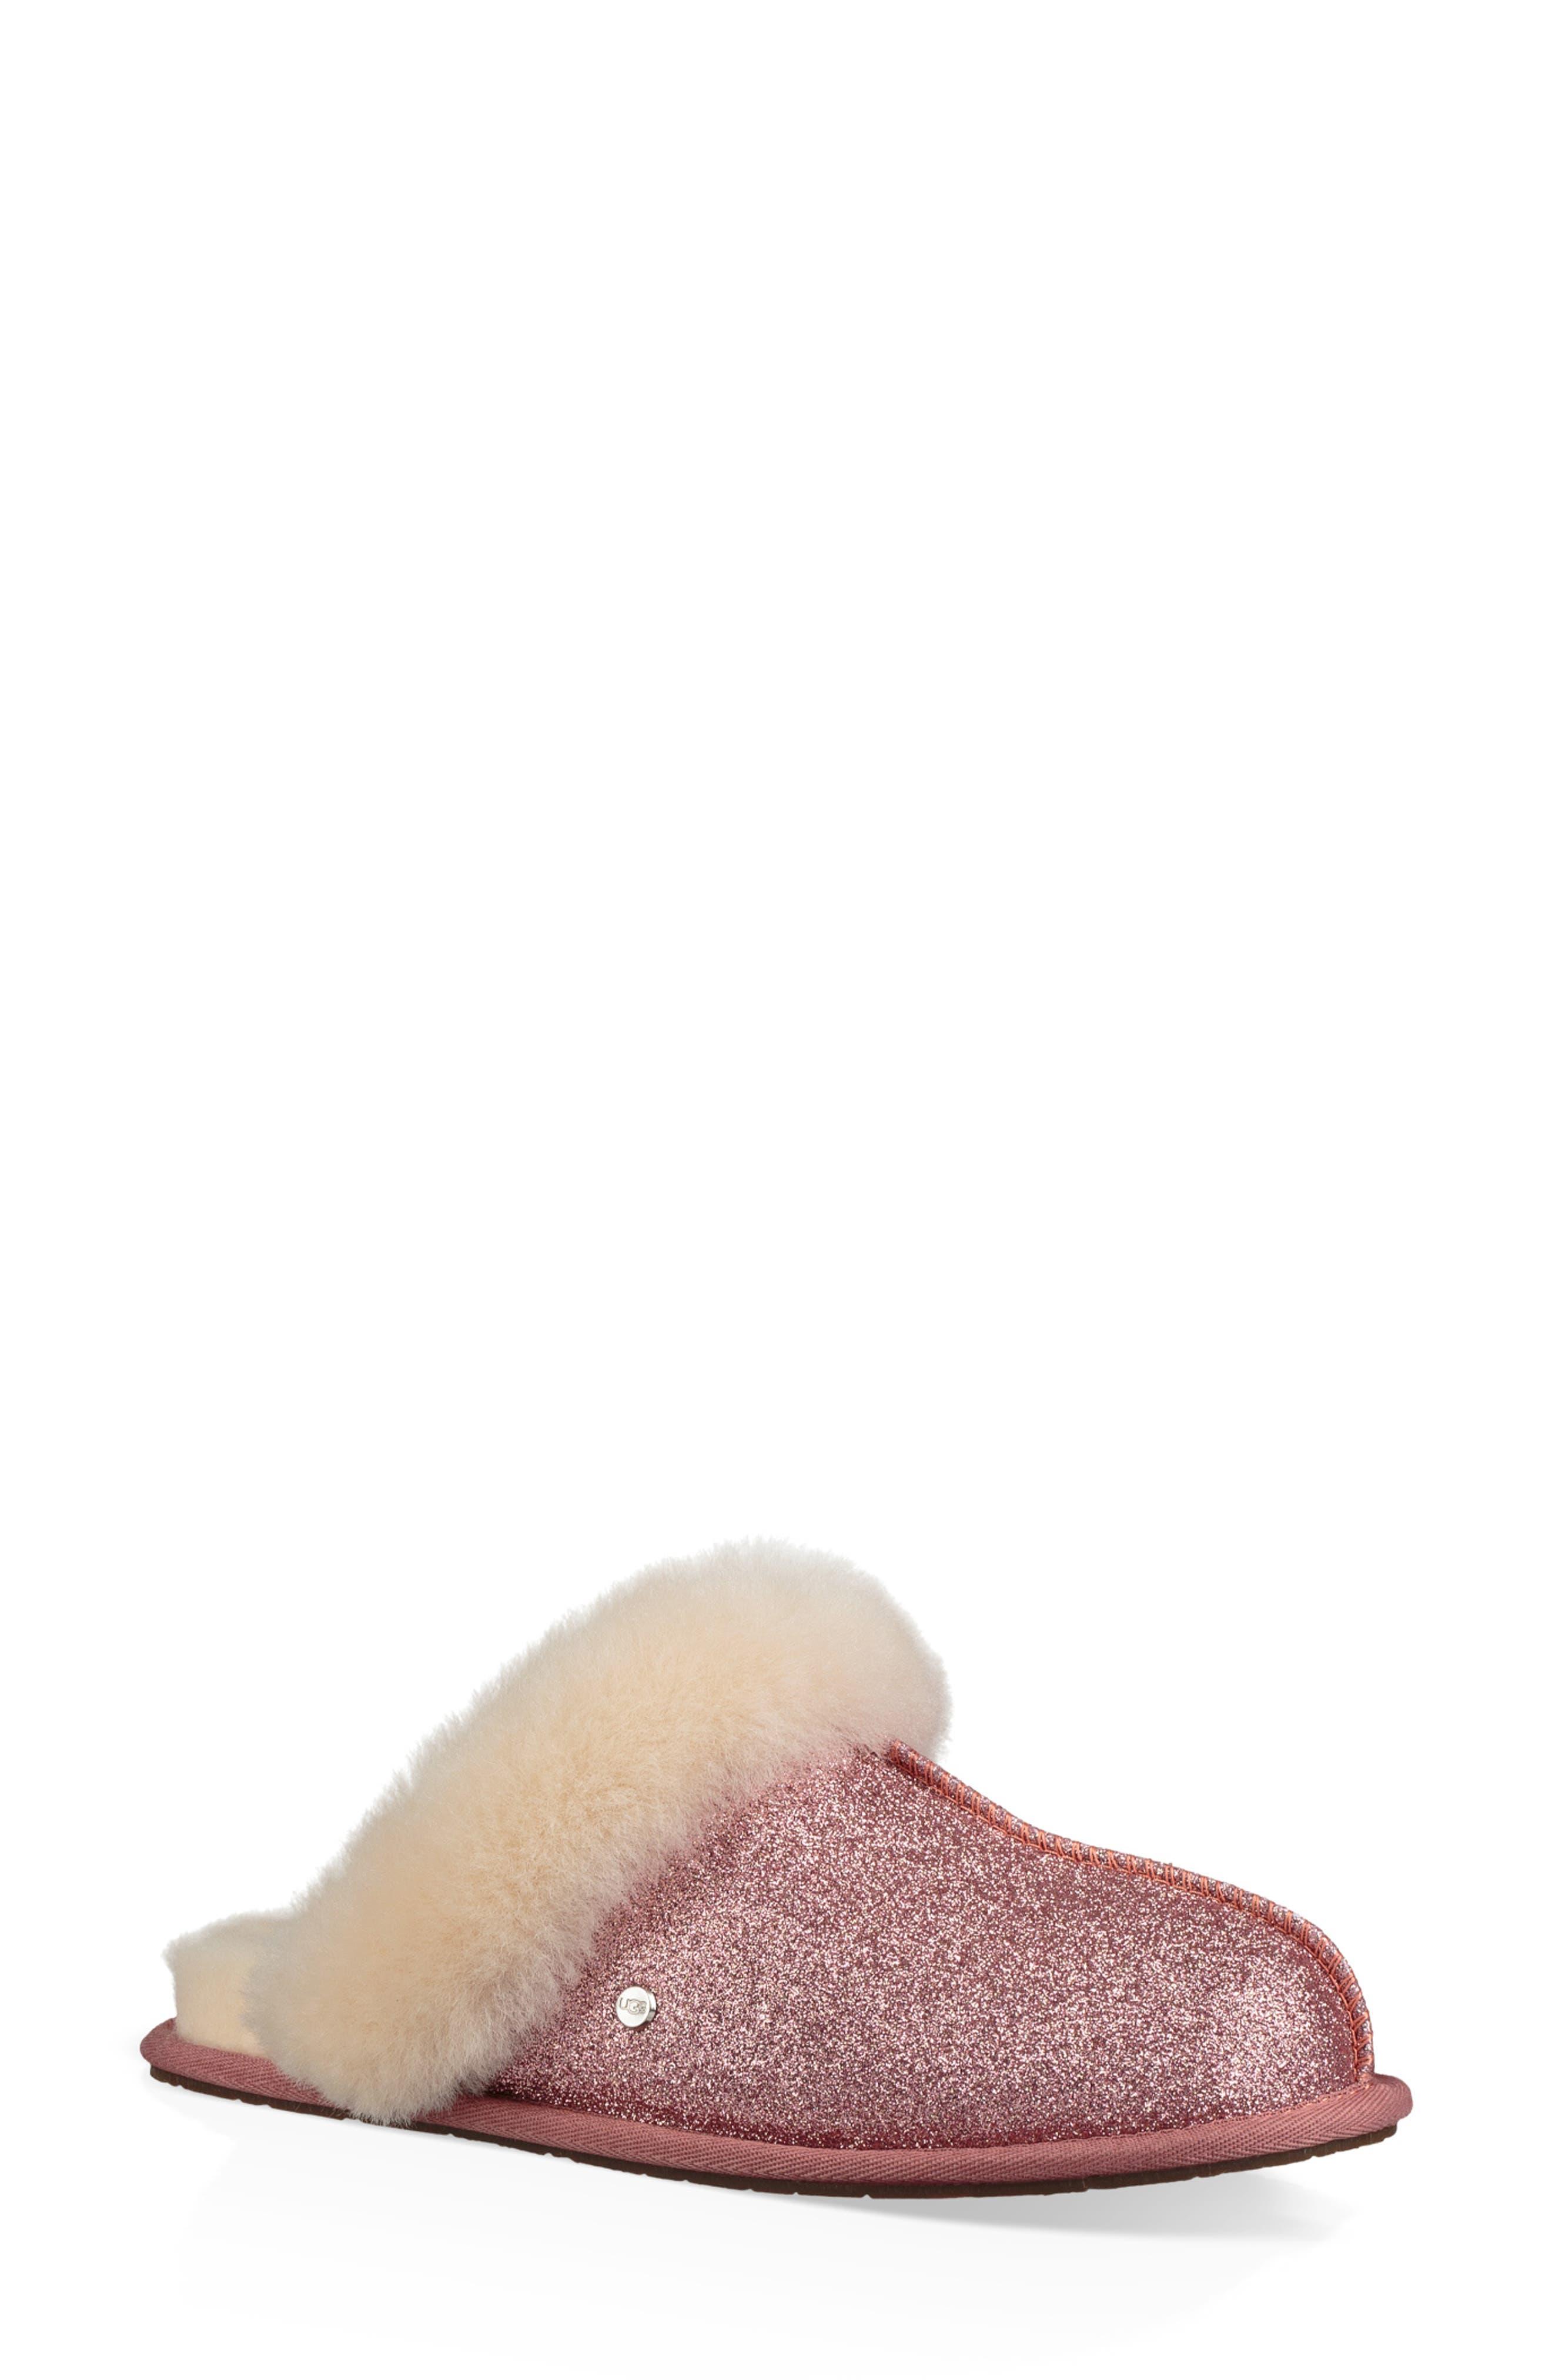 Ugg Scuffette Ii Sparkle Genuine Shearling Slipper, Pink